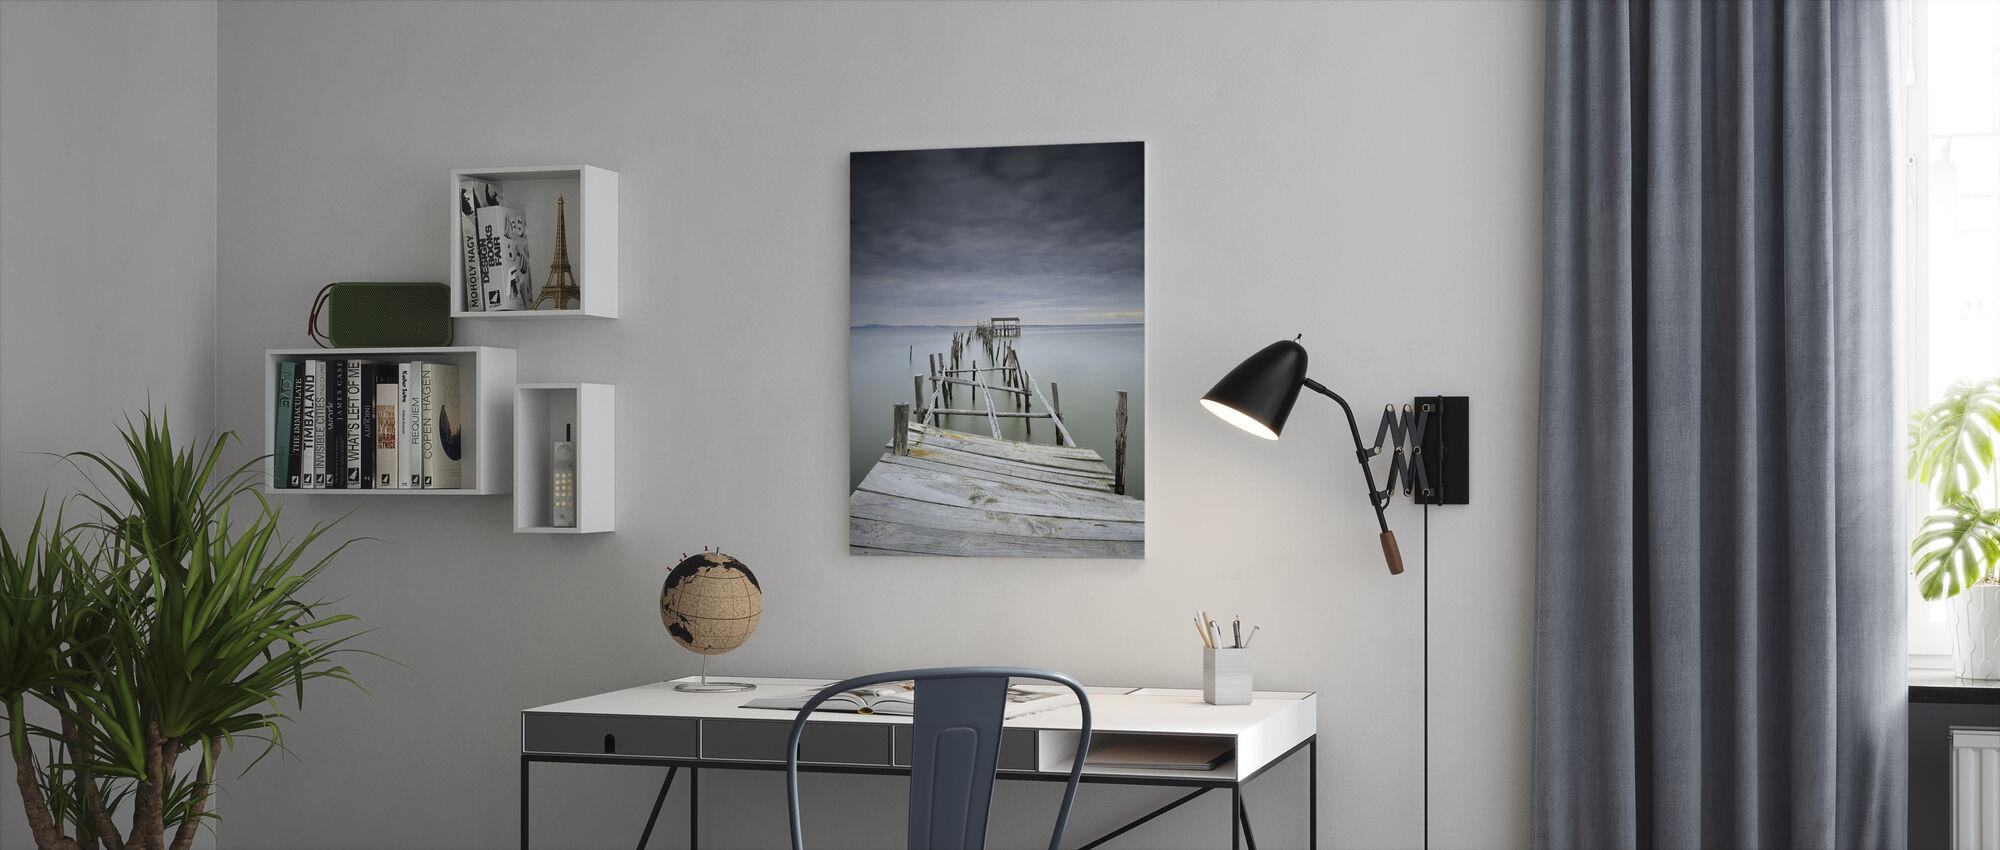 Unreachable - Canvas print - Office